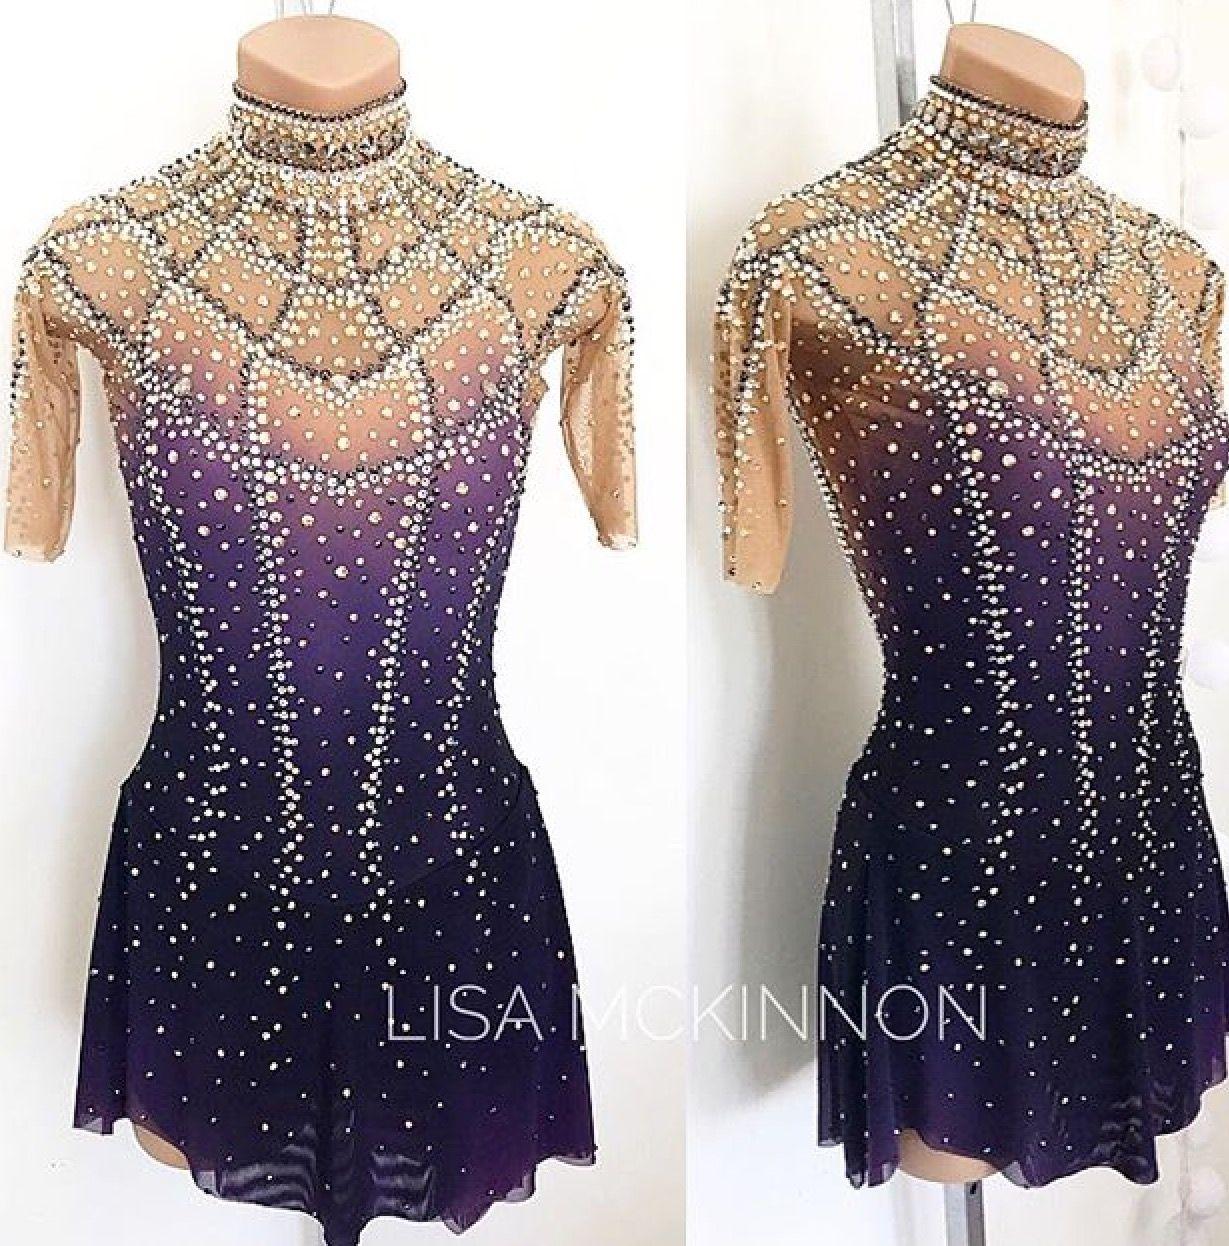 Lisa Mckinnon Custom Dress Patinaje Vestidos De